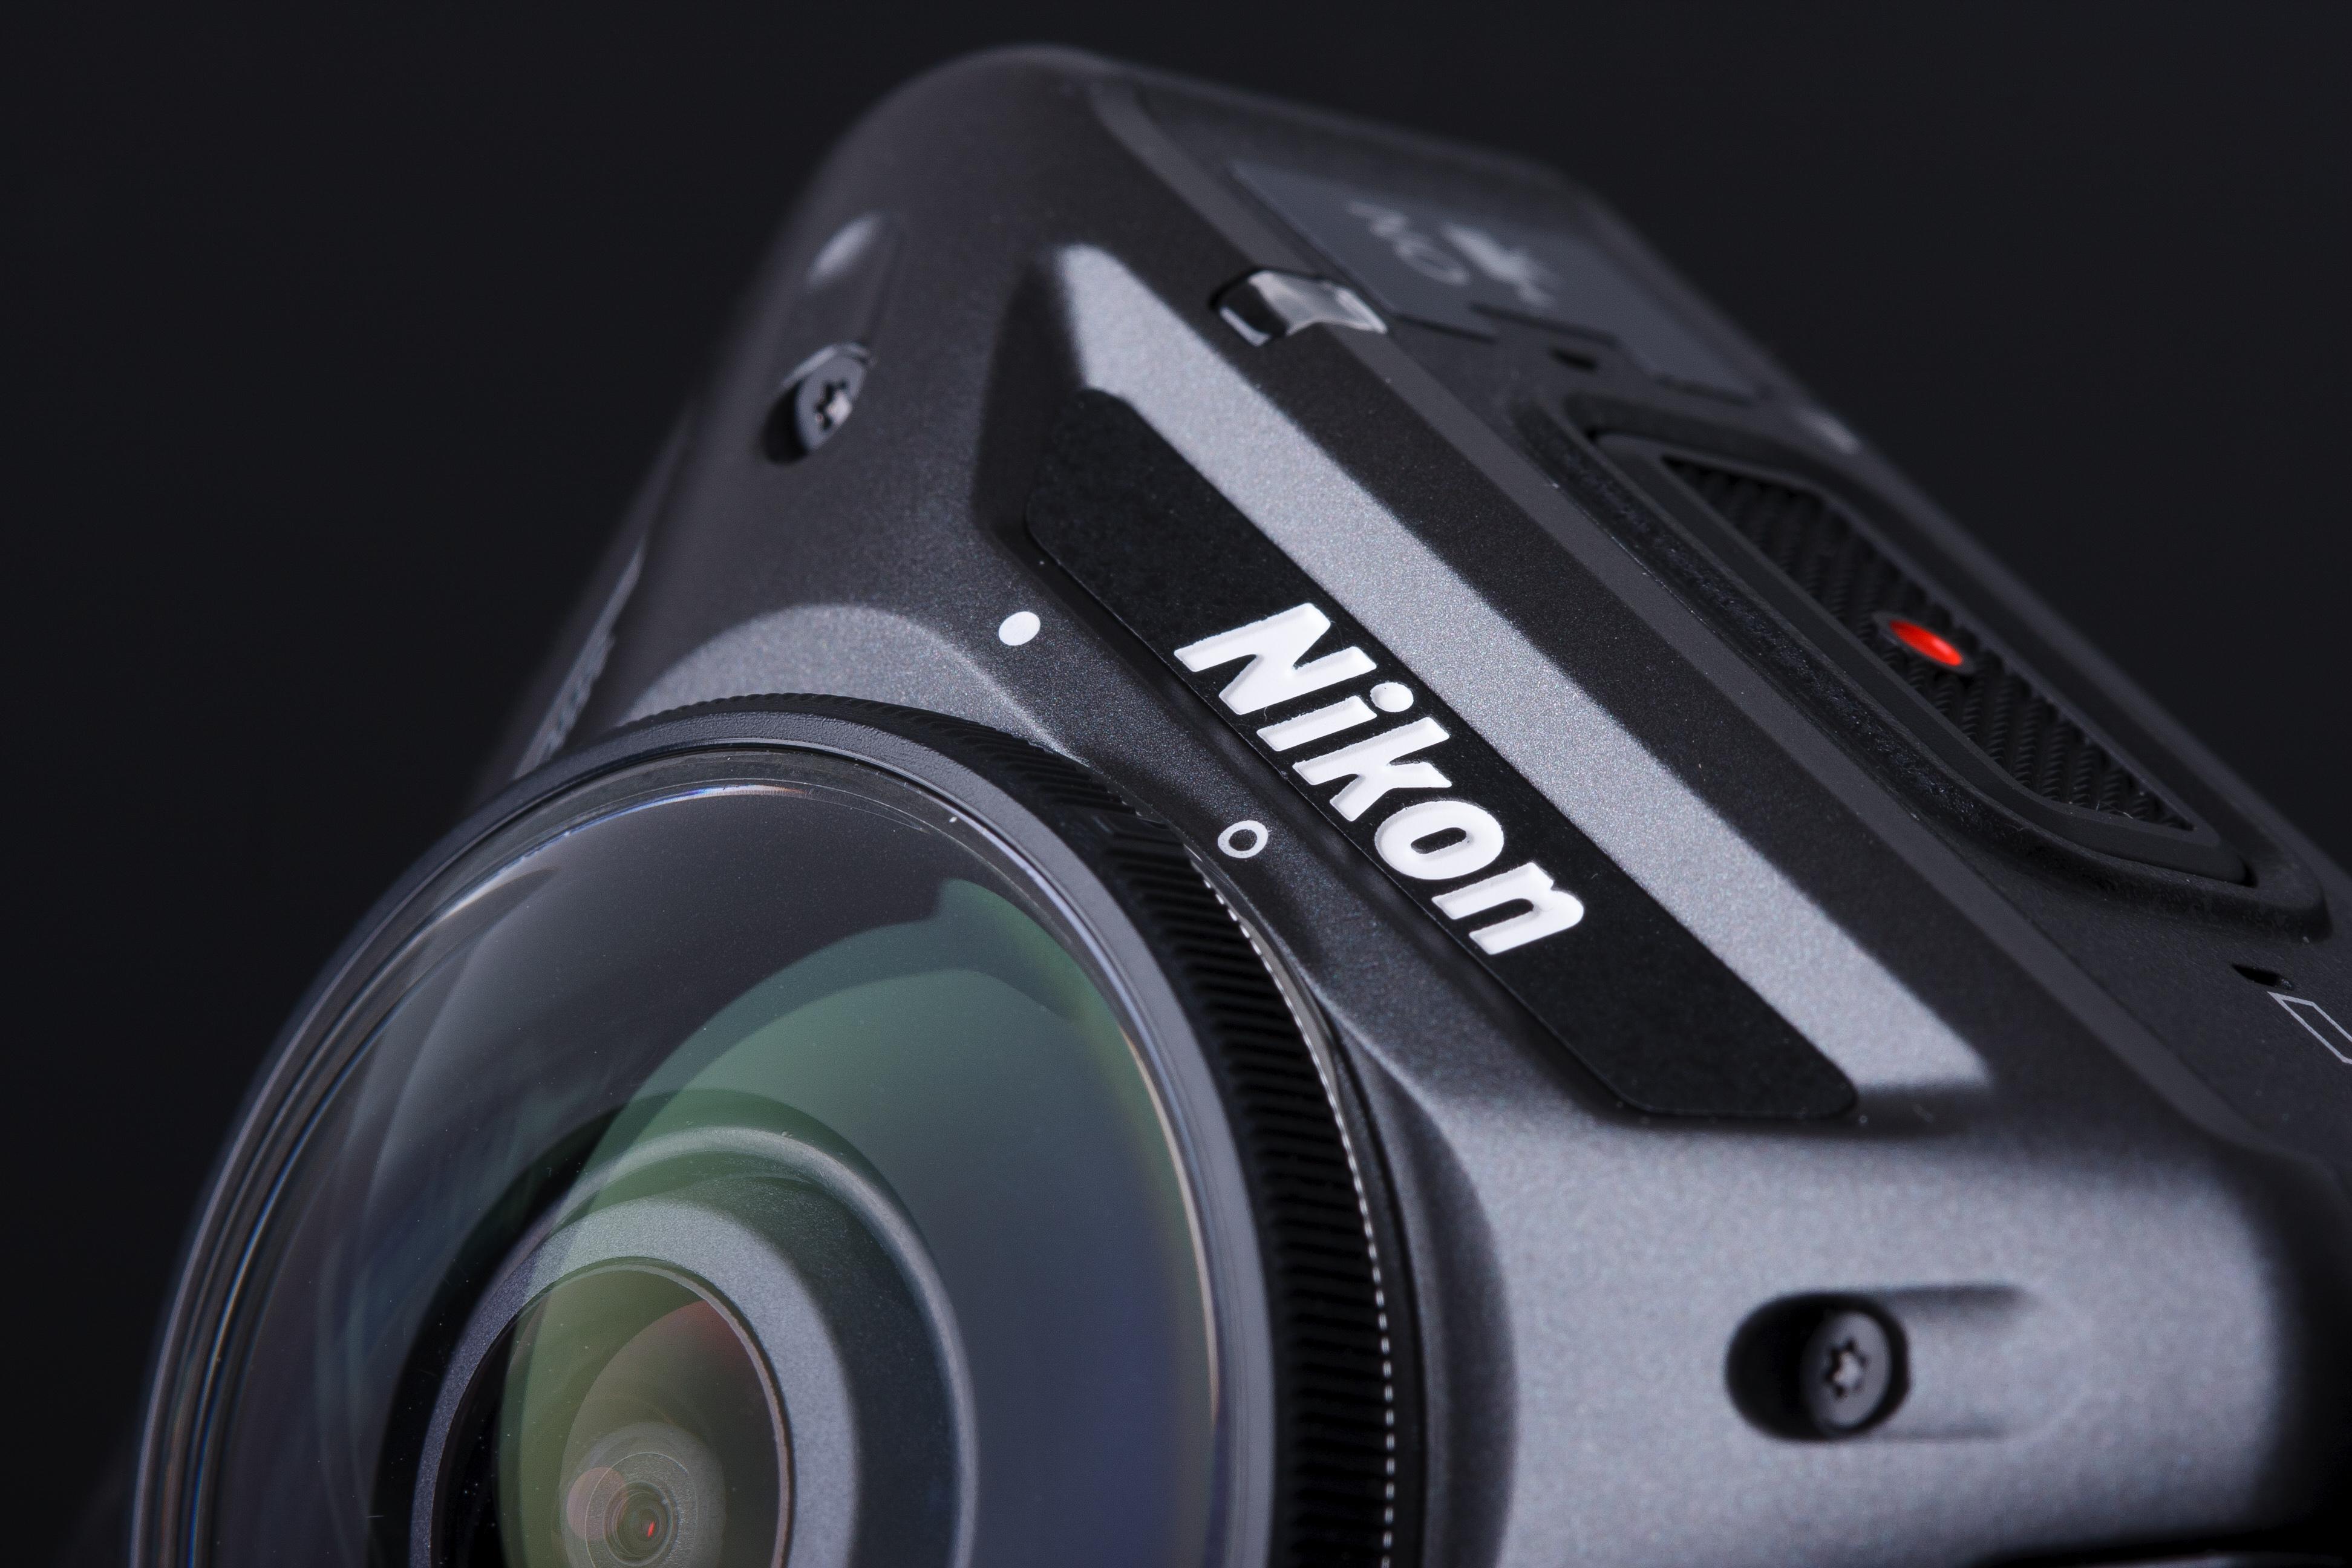 Sphere of frustration: Nikon KeyMission 360 review: Digital